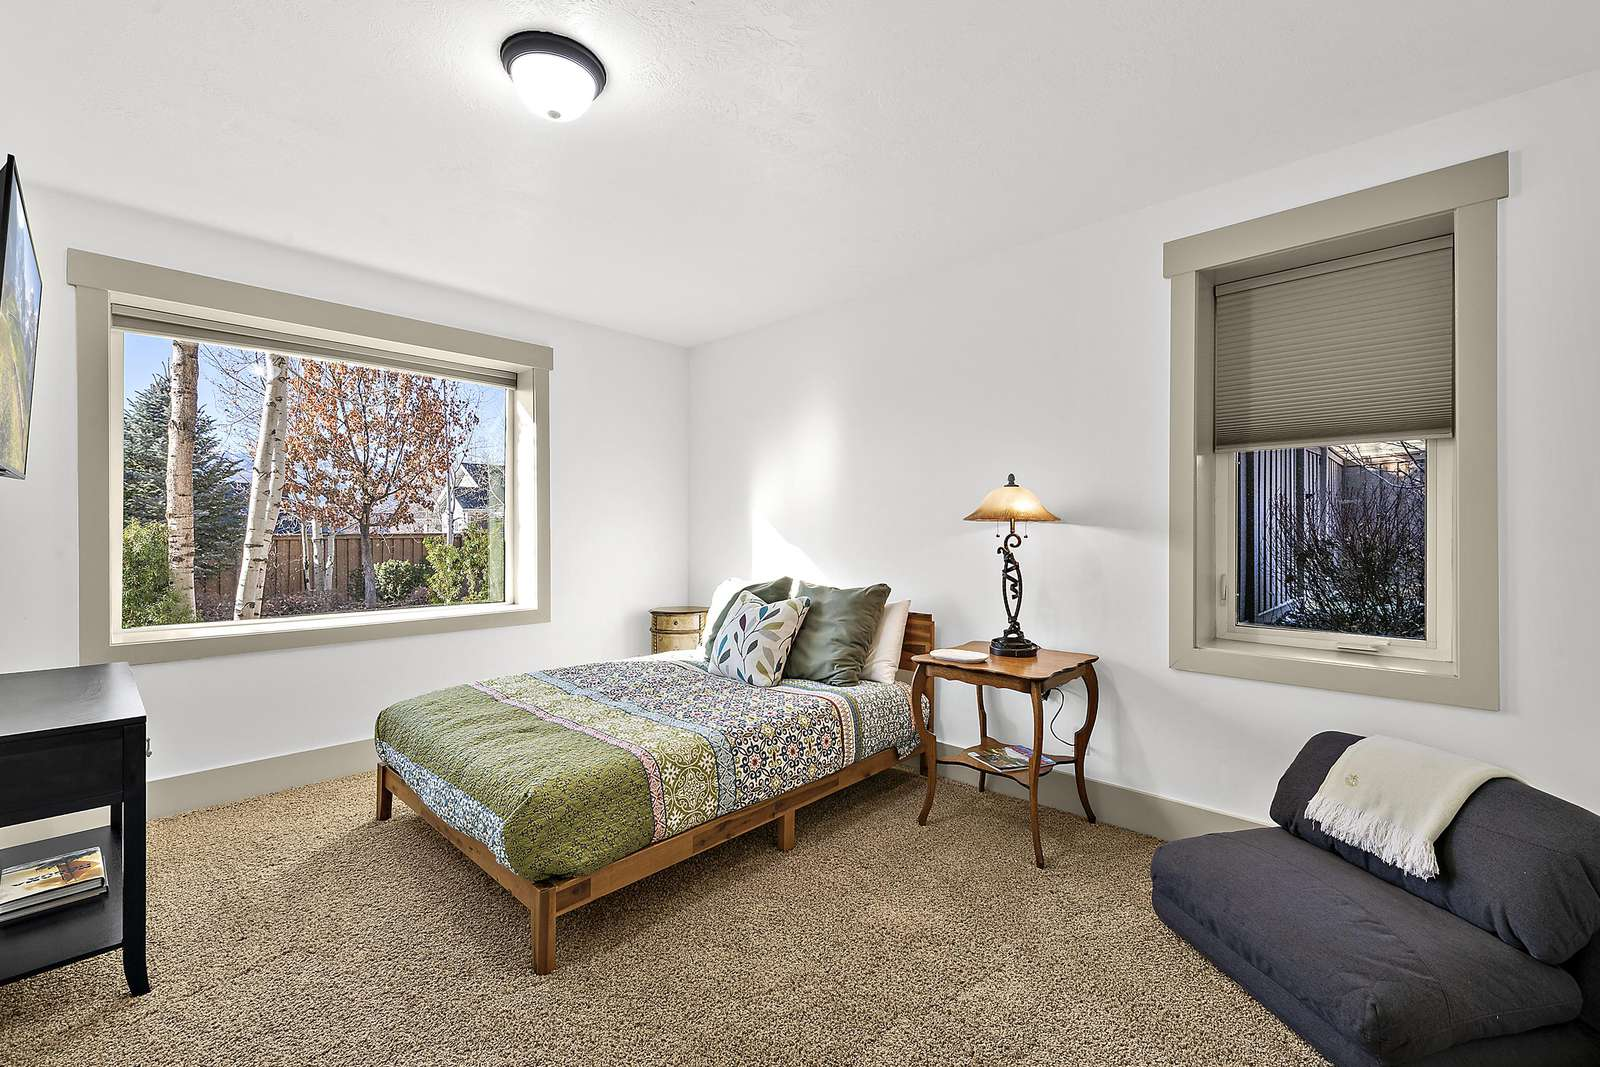 Guest bedroom with window views